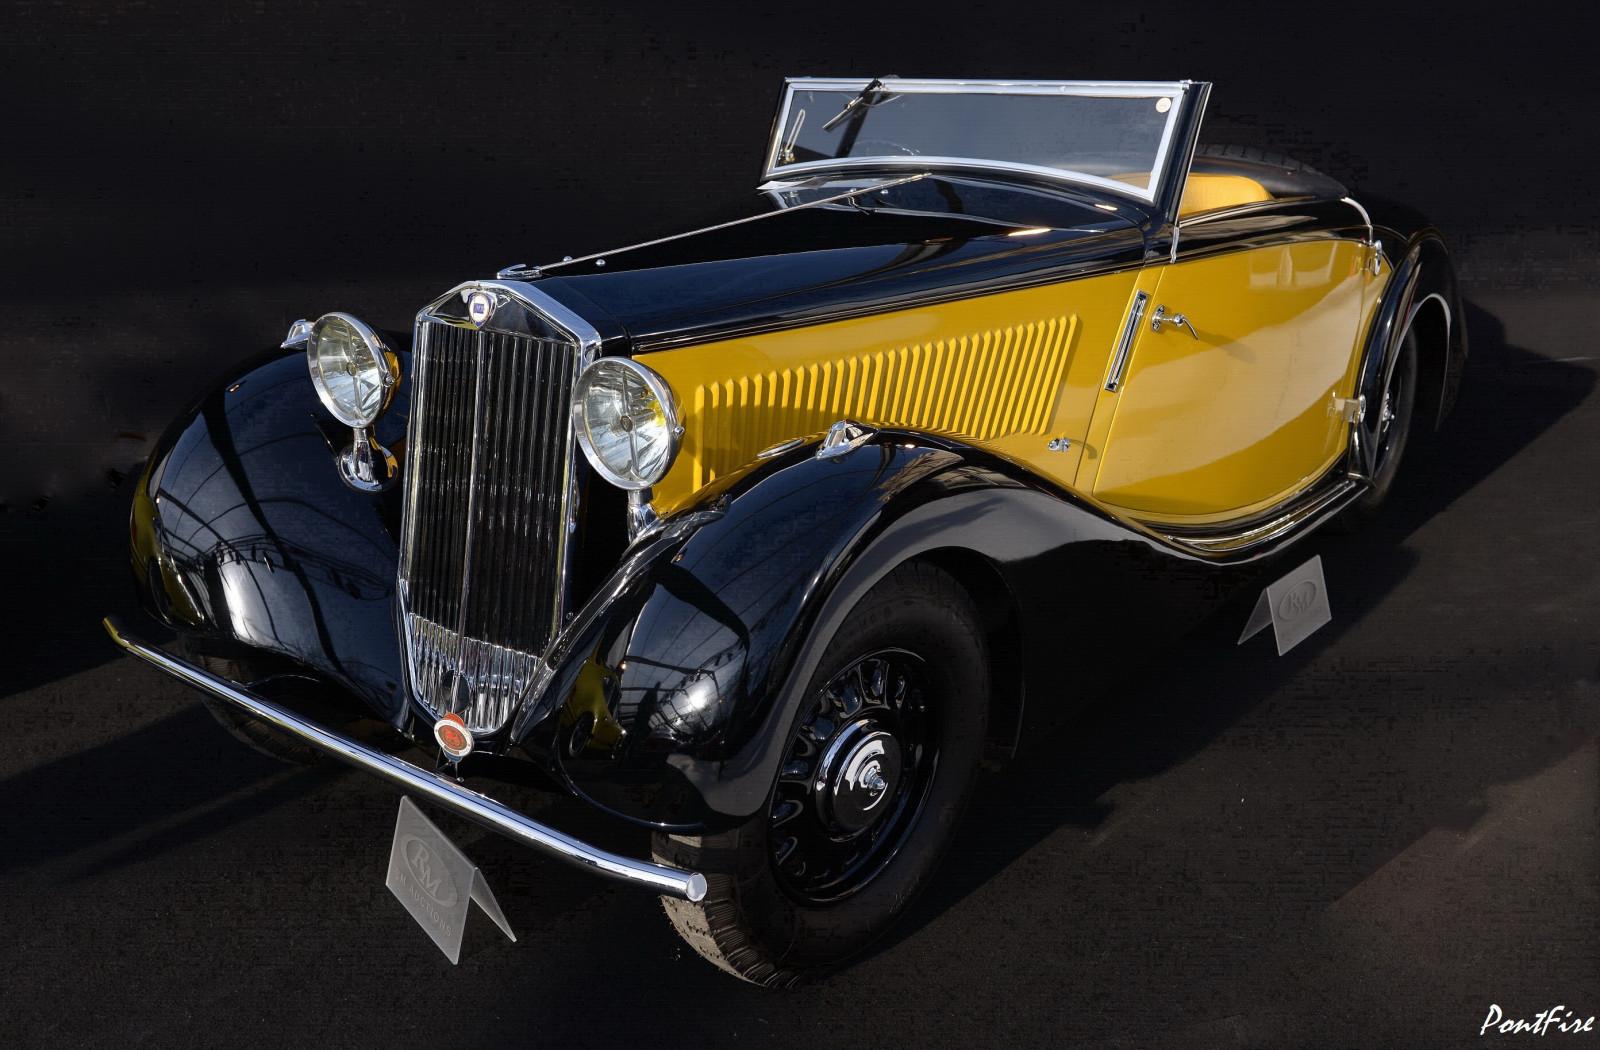 papel de parede carro fran a paris eclipse carro antigo carro cl ssico voiture lancia. Black Bedroom Furniture Sets. Home Design Ideas